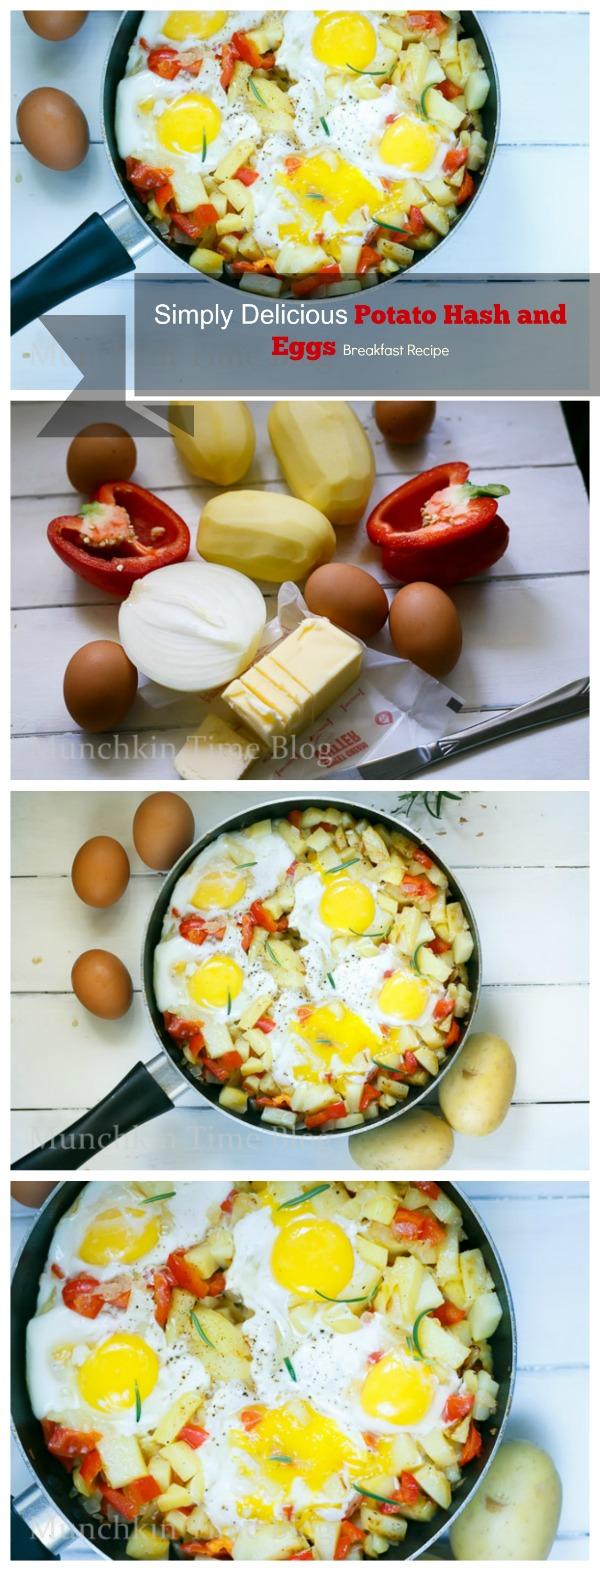 Simply Delicious Potato Hash And Eggs BreakfastRecipe Munchkintime